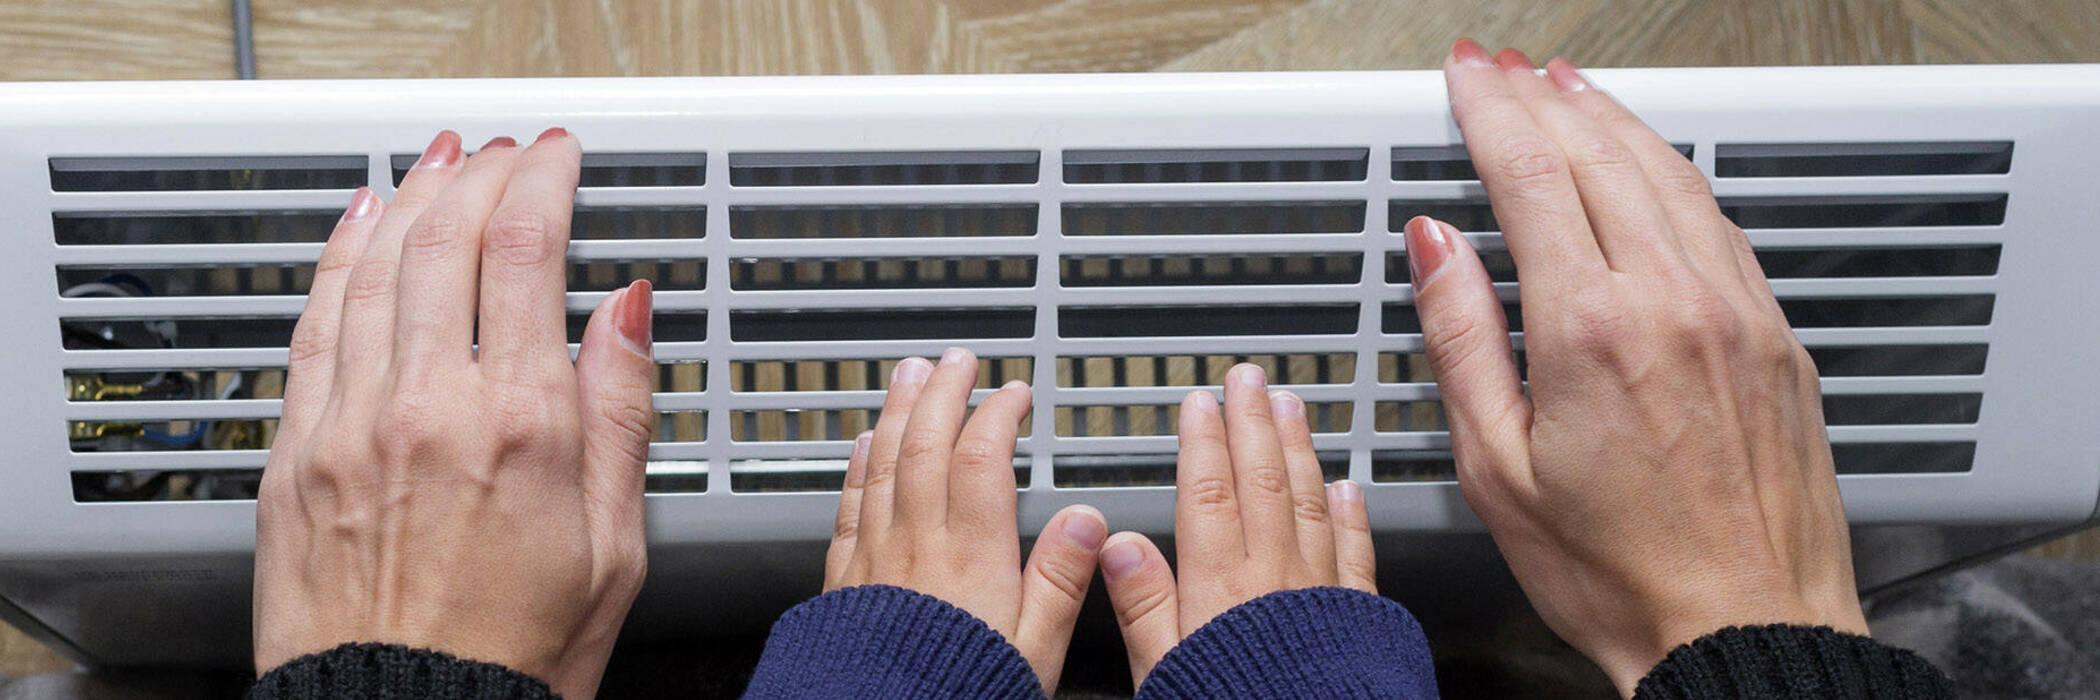 17jun electric heaters hero